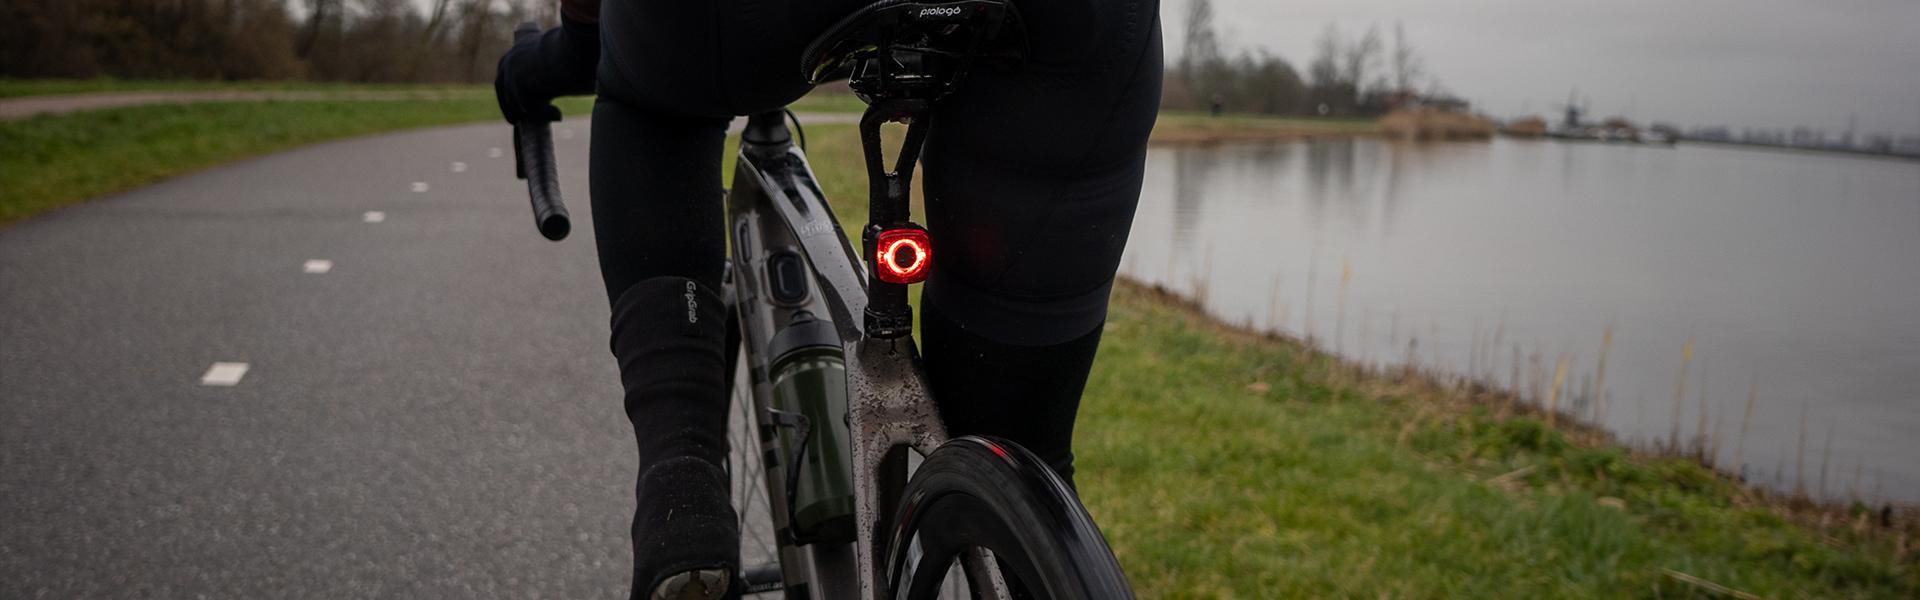 Sate-lite CREE 15lux ebike light  StVZO ECE  eletric bike headlight with StVZO ECE reflector front fork 6-48V